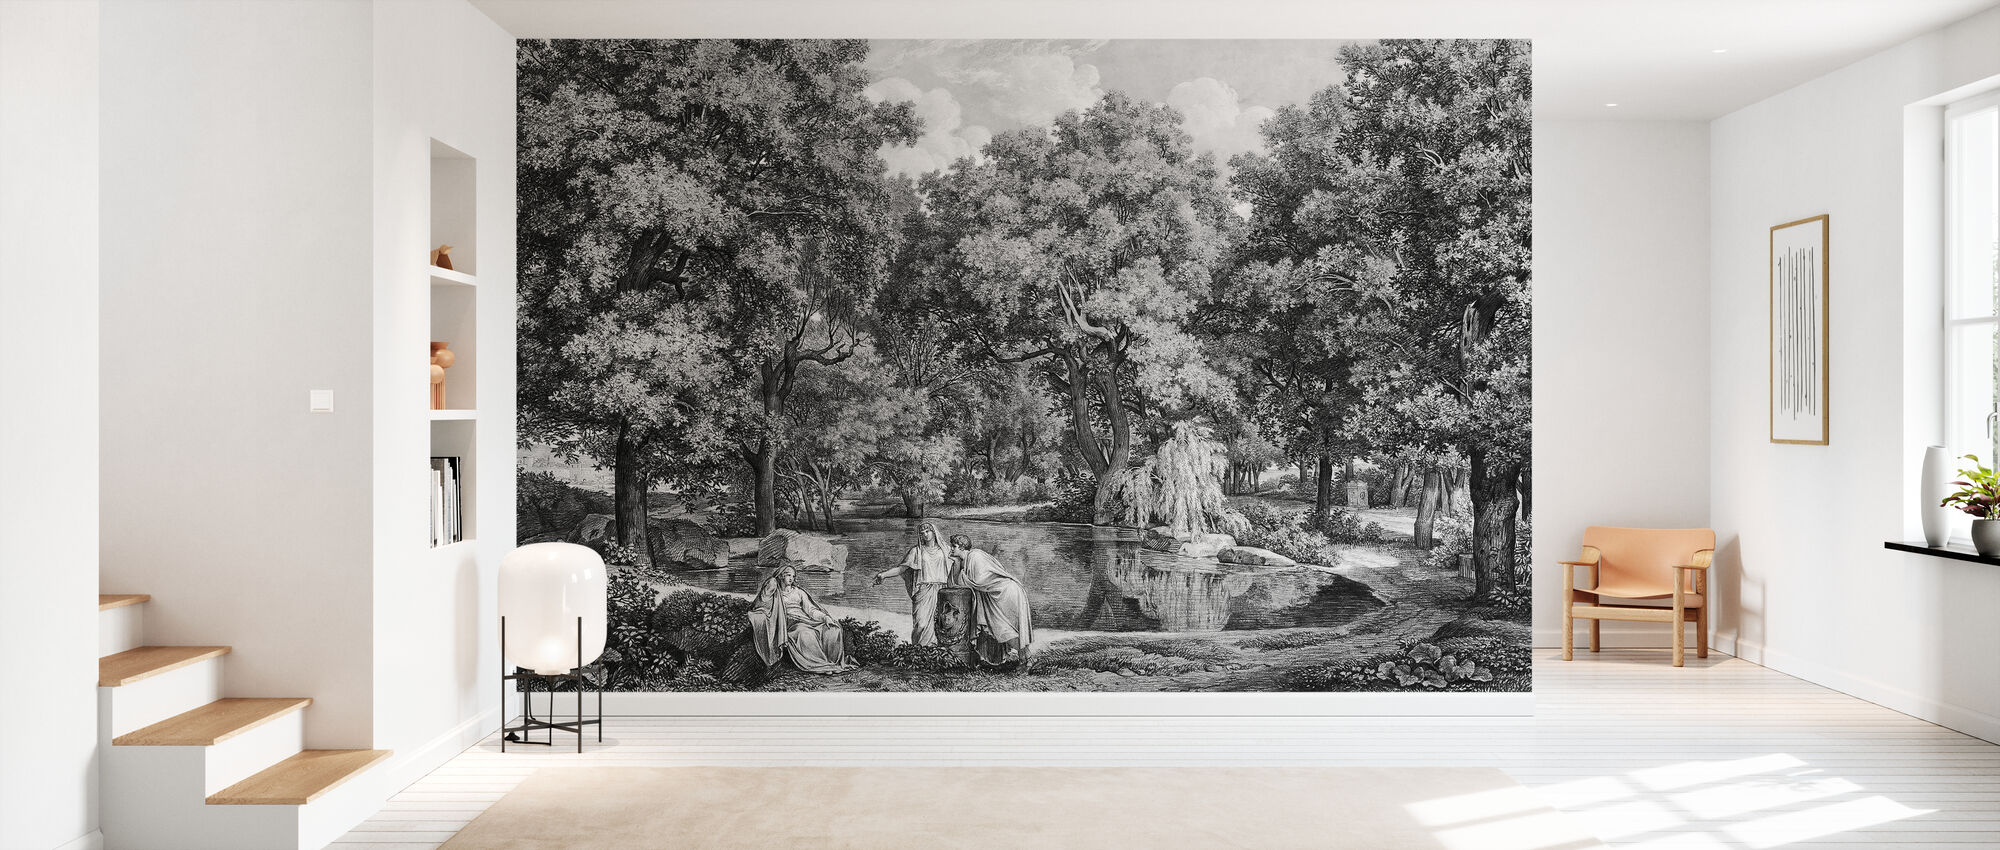 Lake side talk - Wallpaper - Hallway